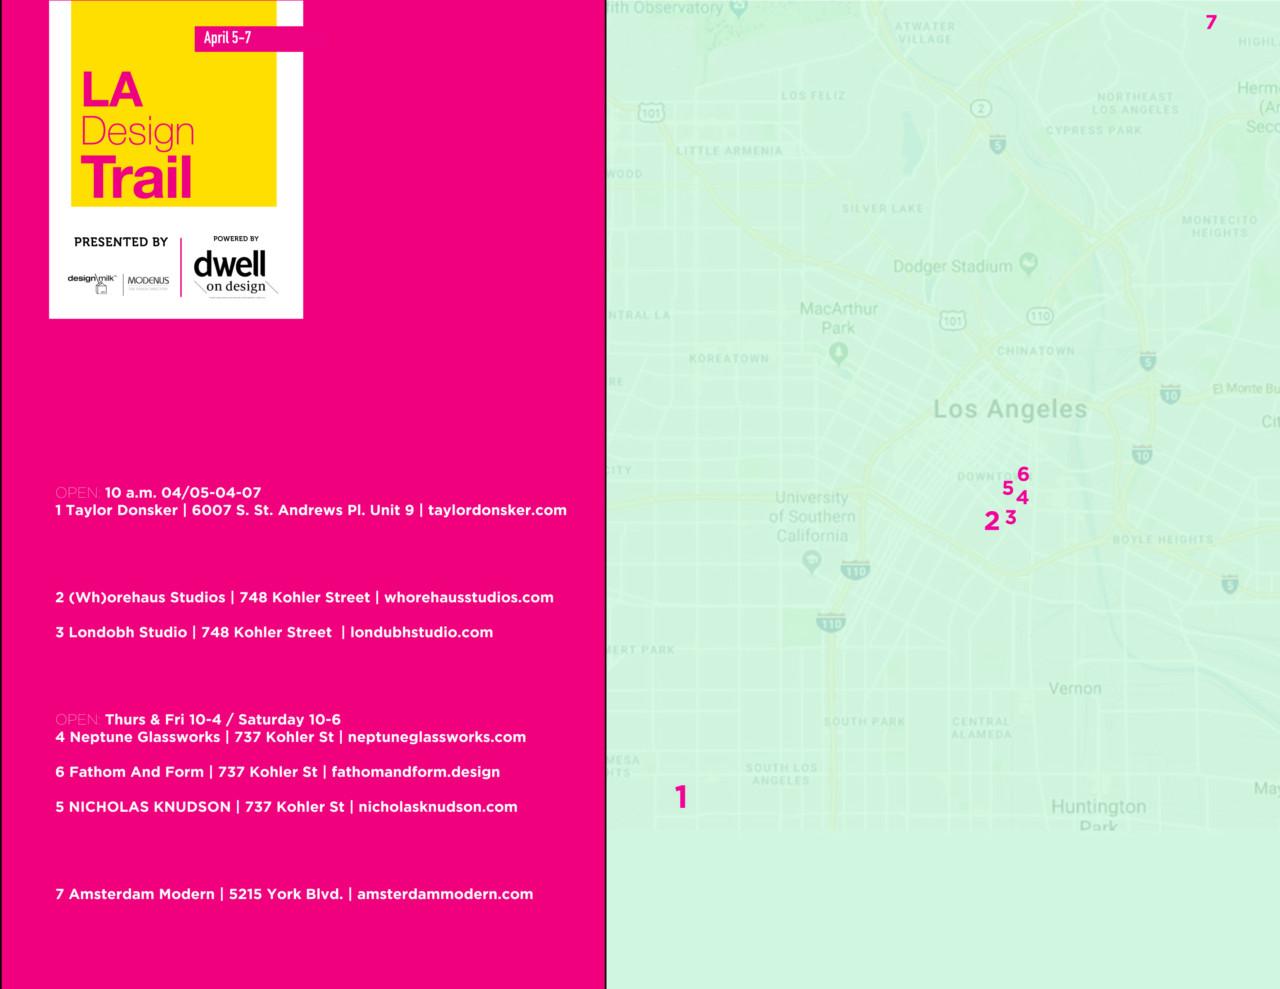 Introducing the 2018 LA Design Trail - Design Milk